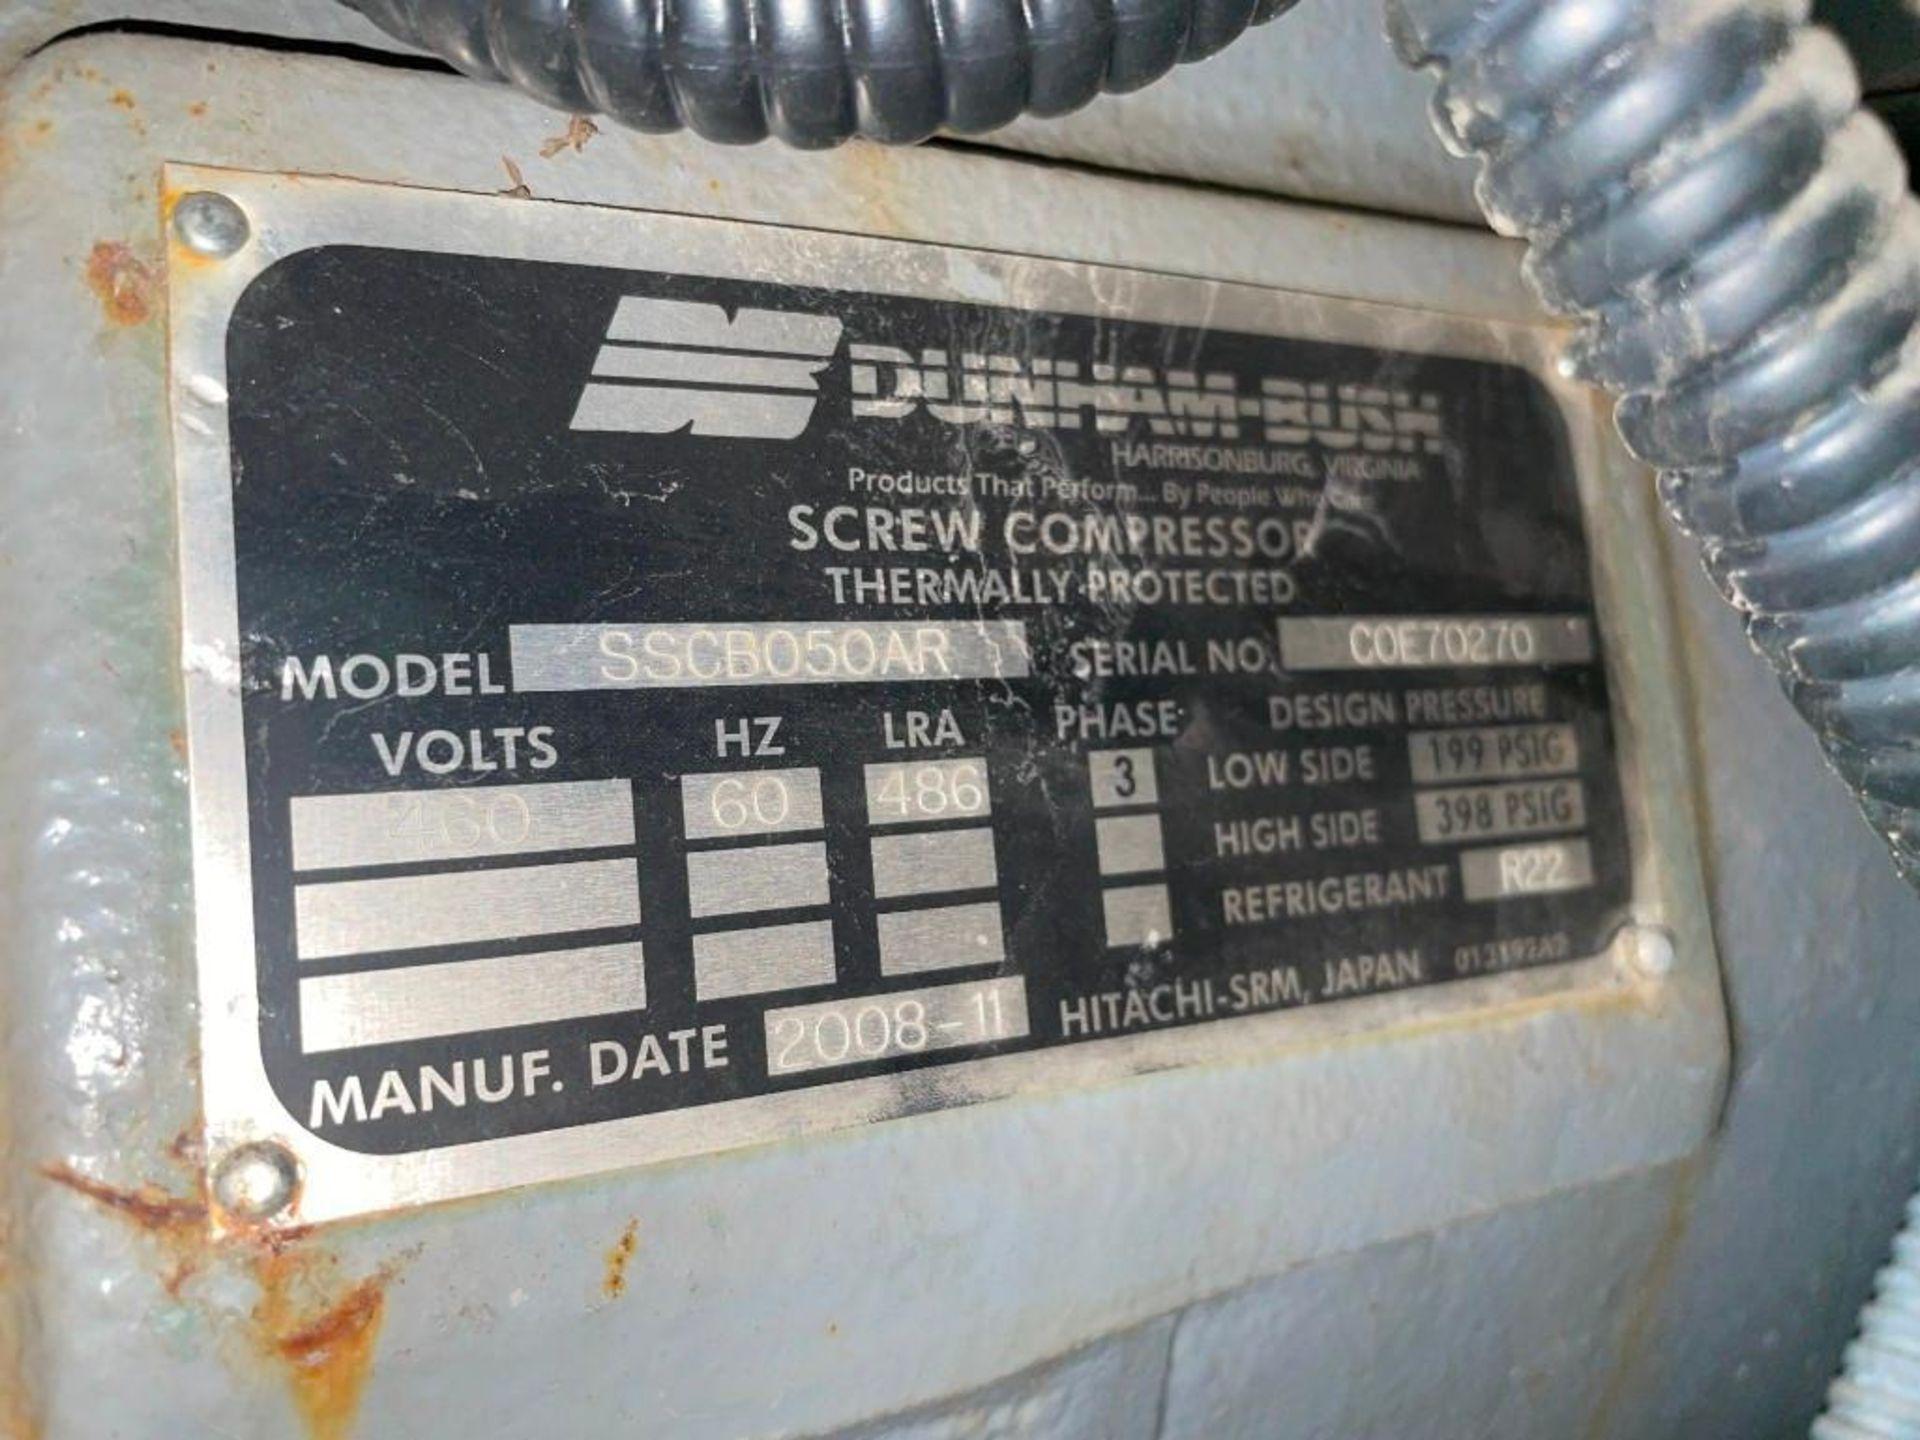 Dunham Bush HWSC-100-DAR Water Chiller - Image 10 of 12